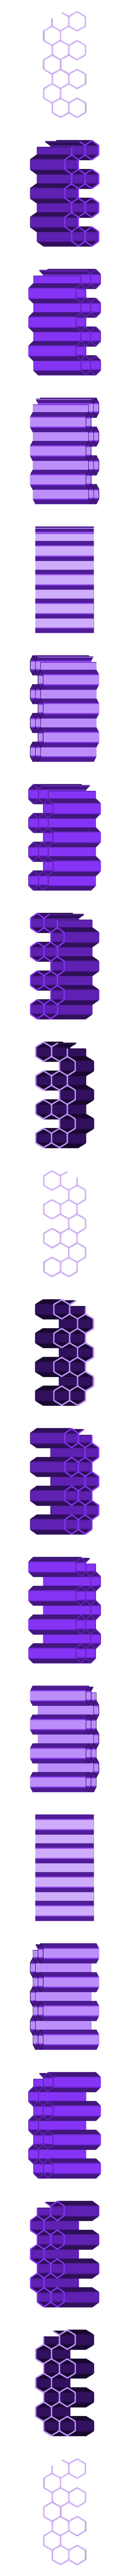 Stand_Beveled_3.stl Download free STL file Mobile Device Modular Honeycomb Stand • 3D printing model, Runstone